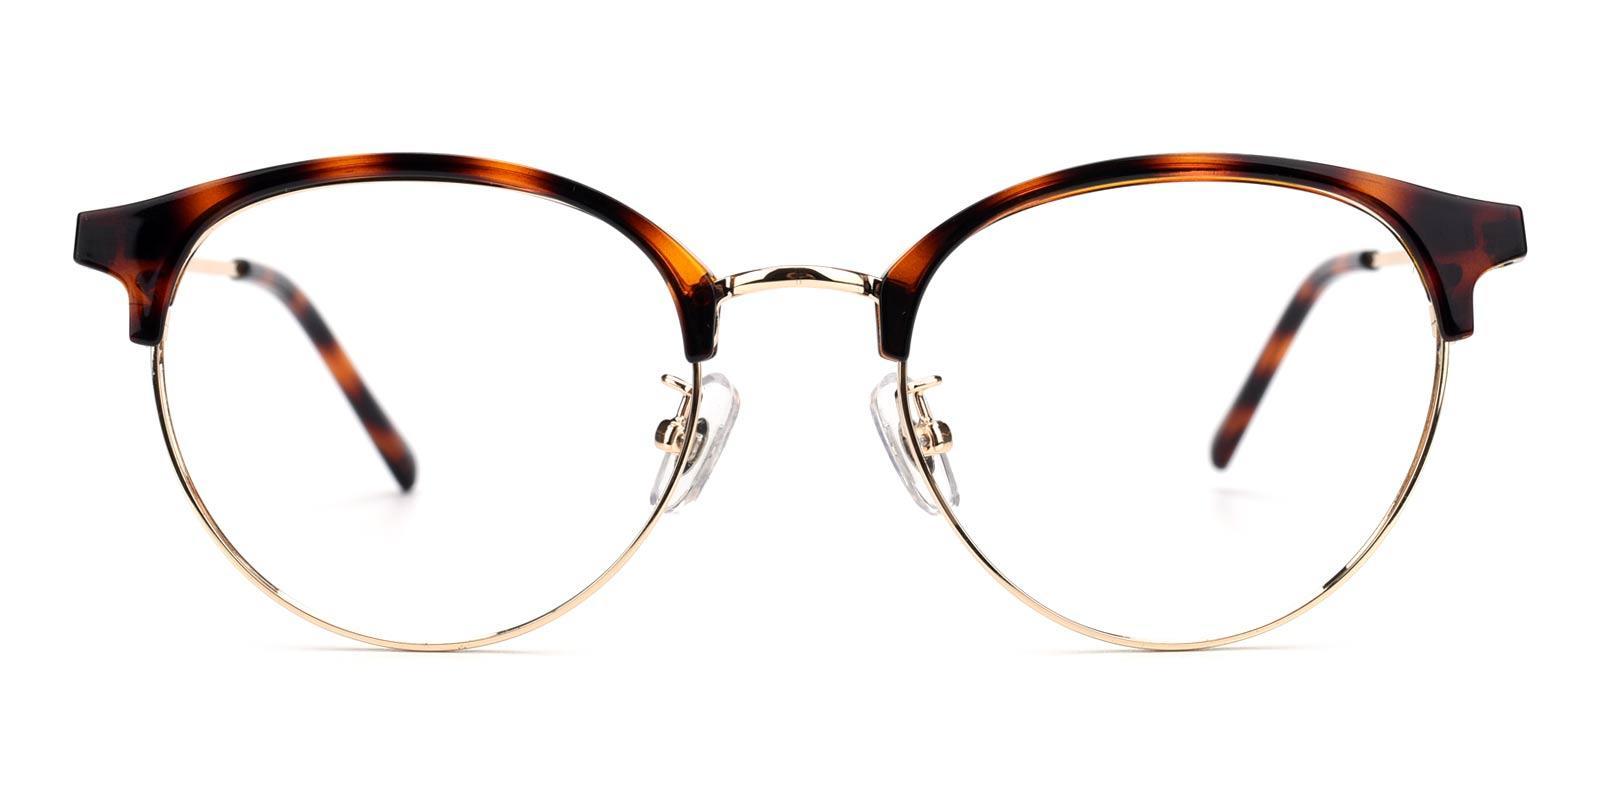 Gaze-Tortoise-Browline-Metal-Eyeglasses-additional2